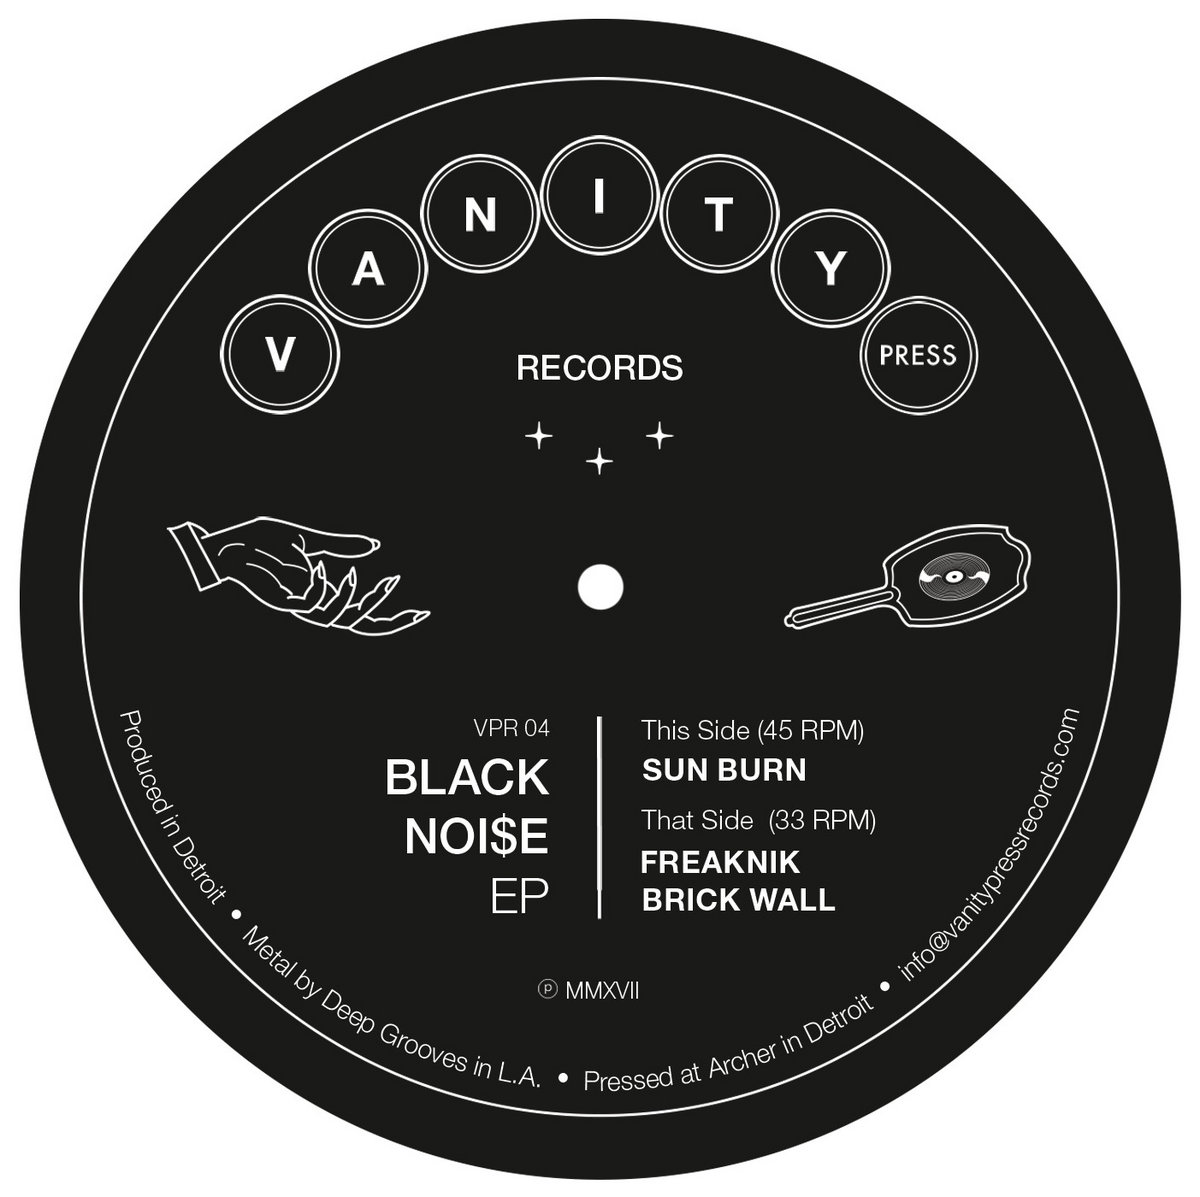 Black Noi$e - Black Noi$e EP (Vanity Press)